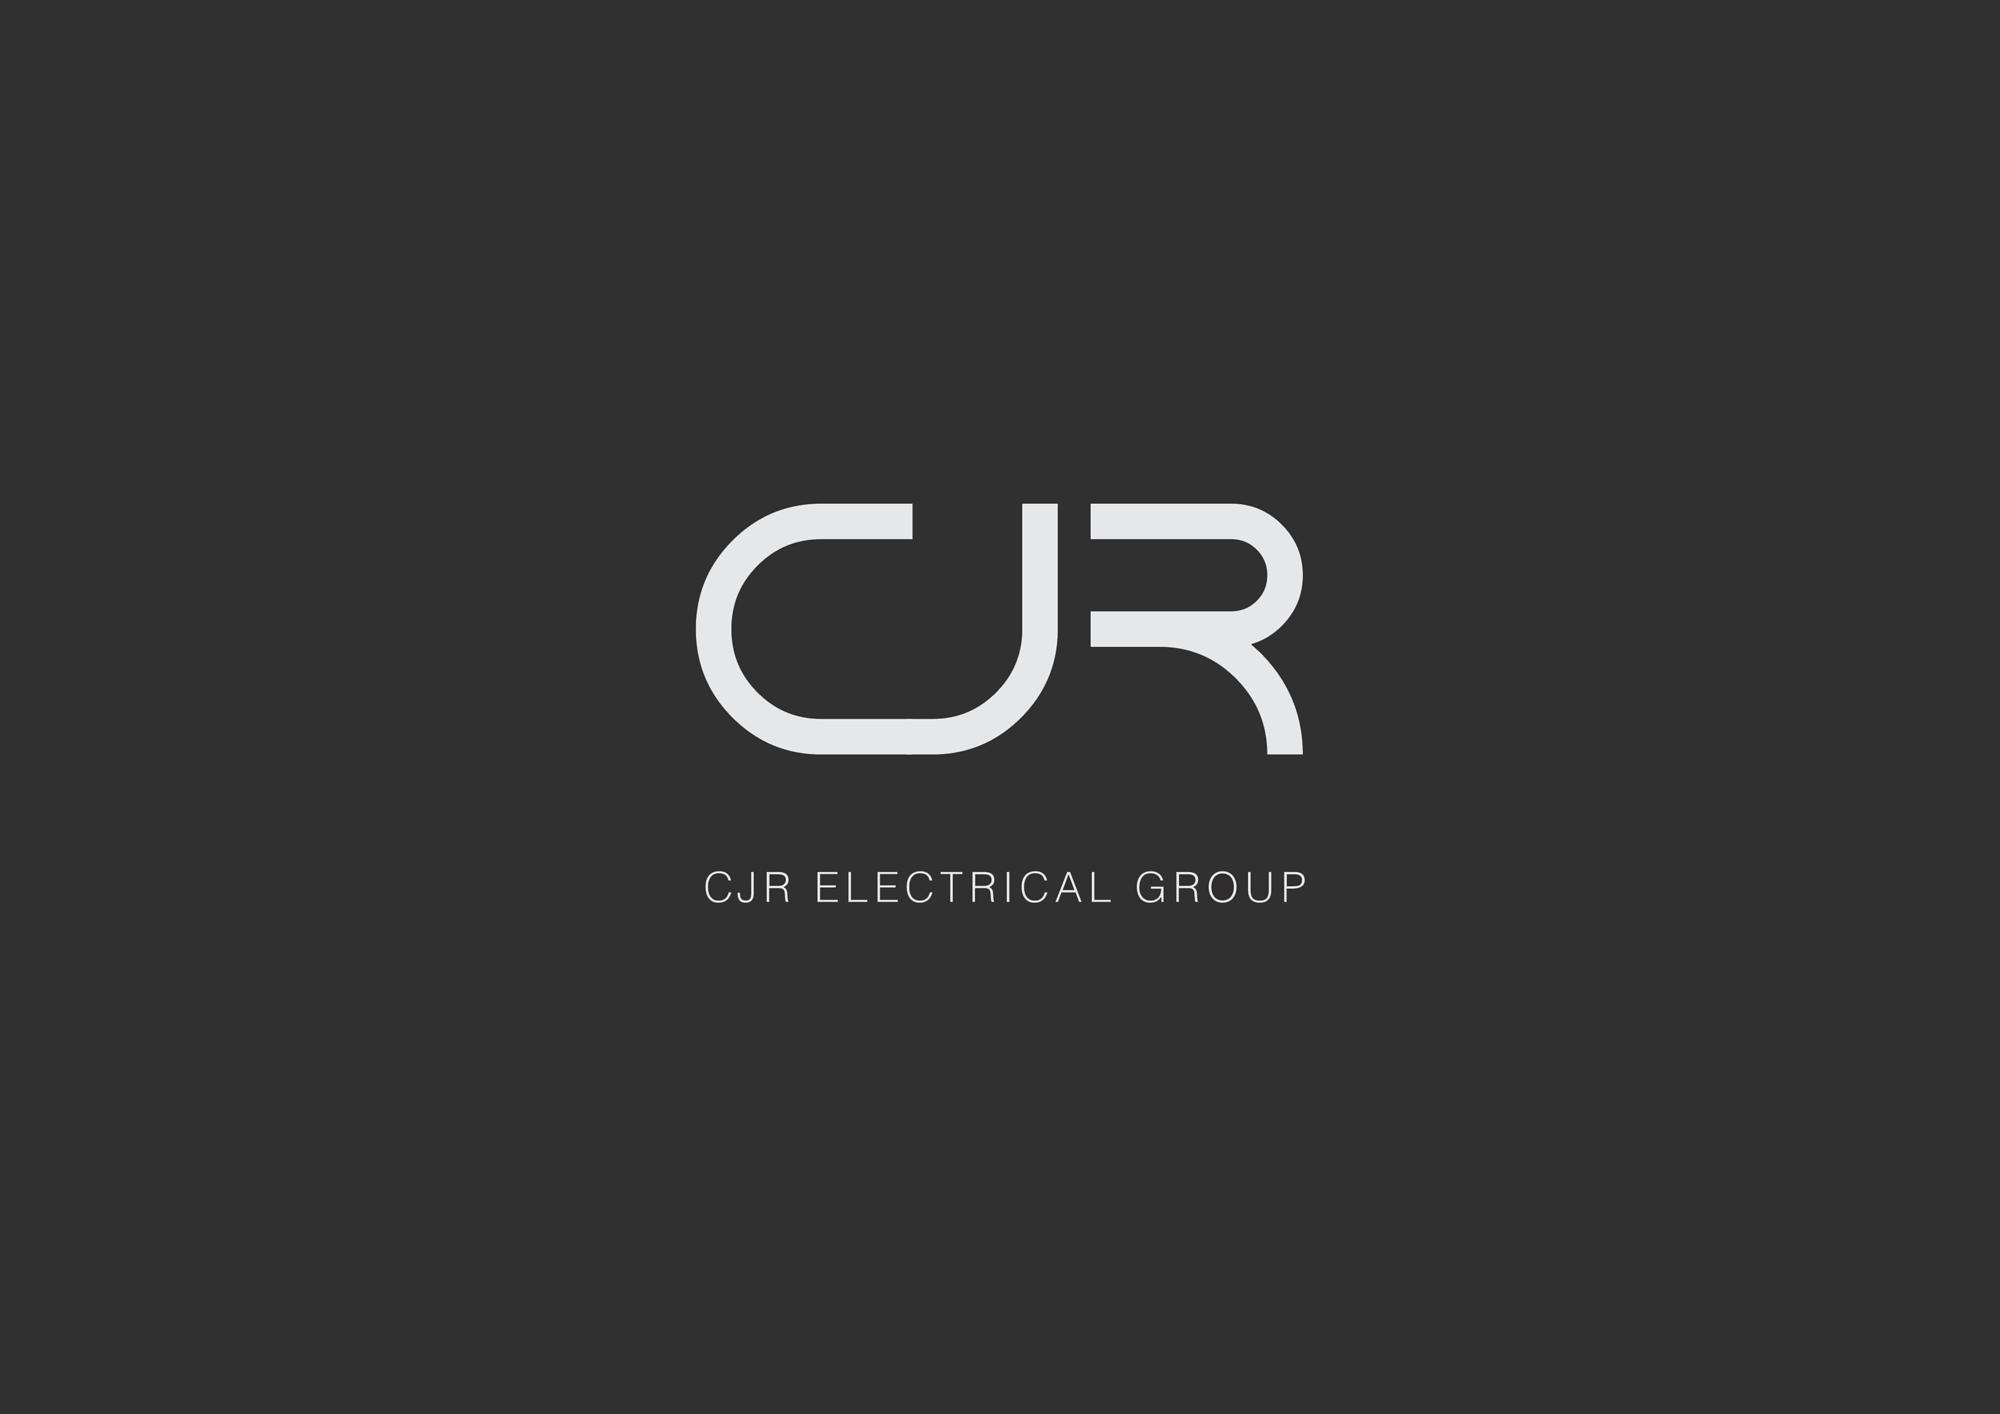 Logo design for electrical company